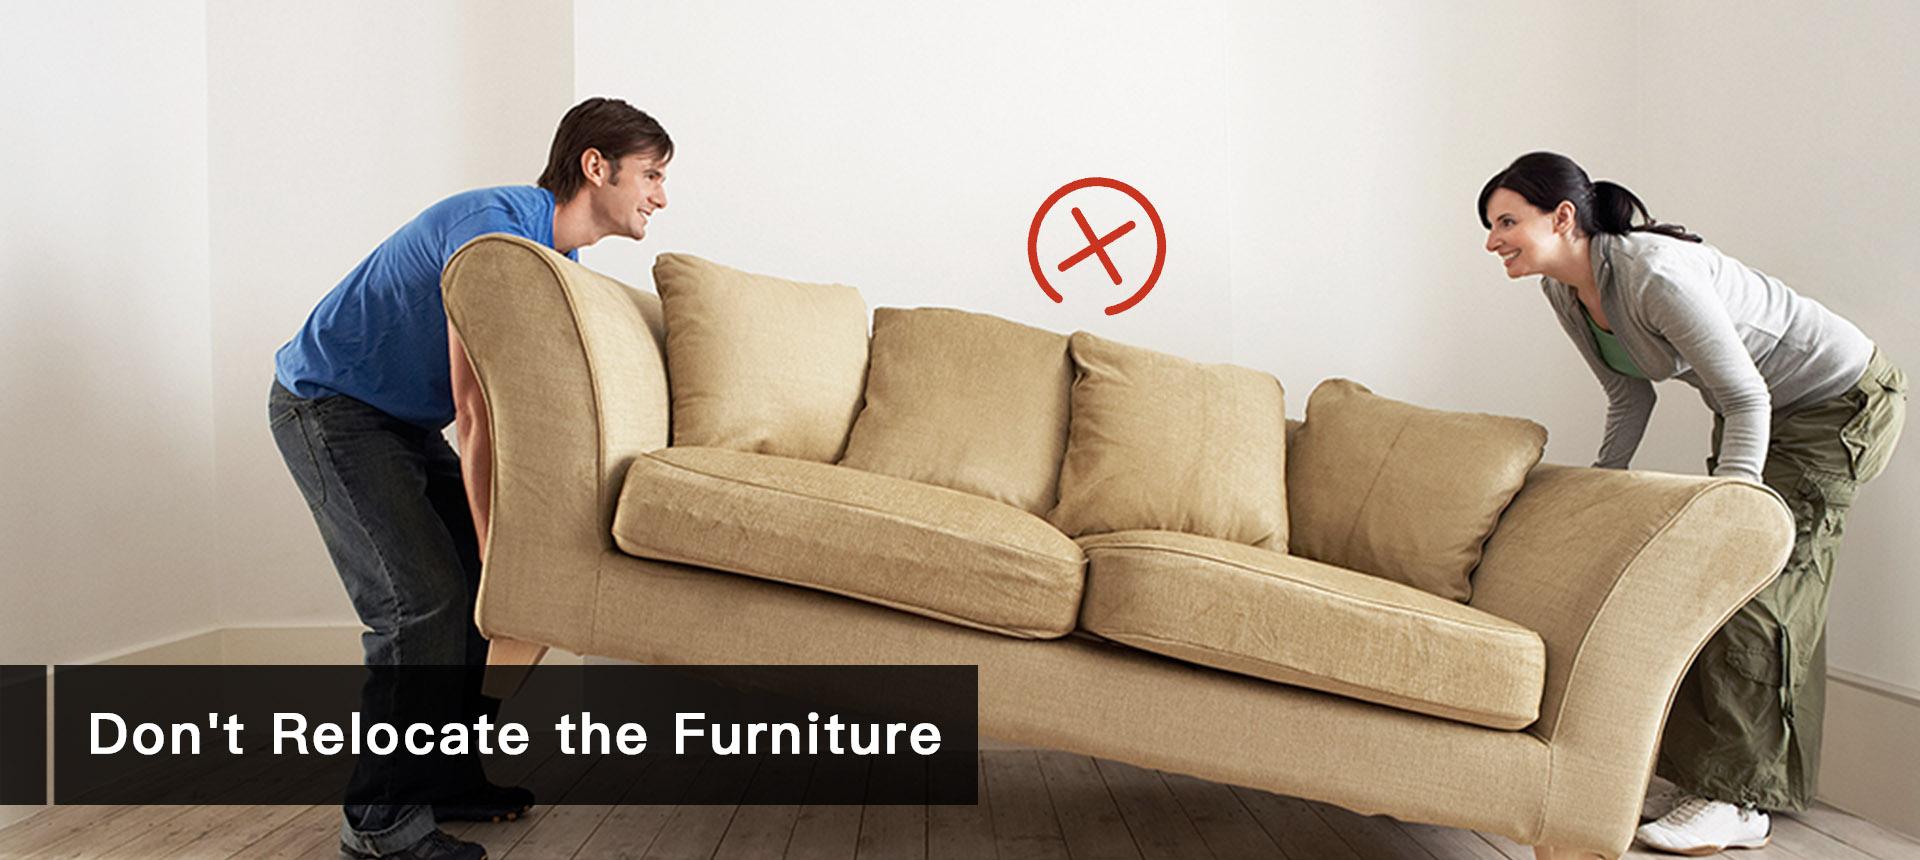 Don't Relocate the Furniture